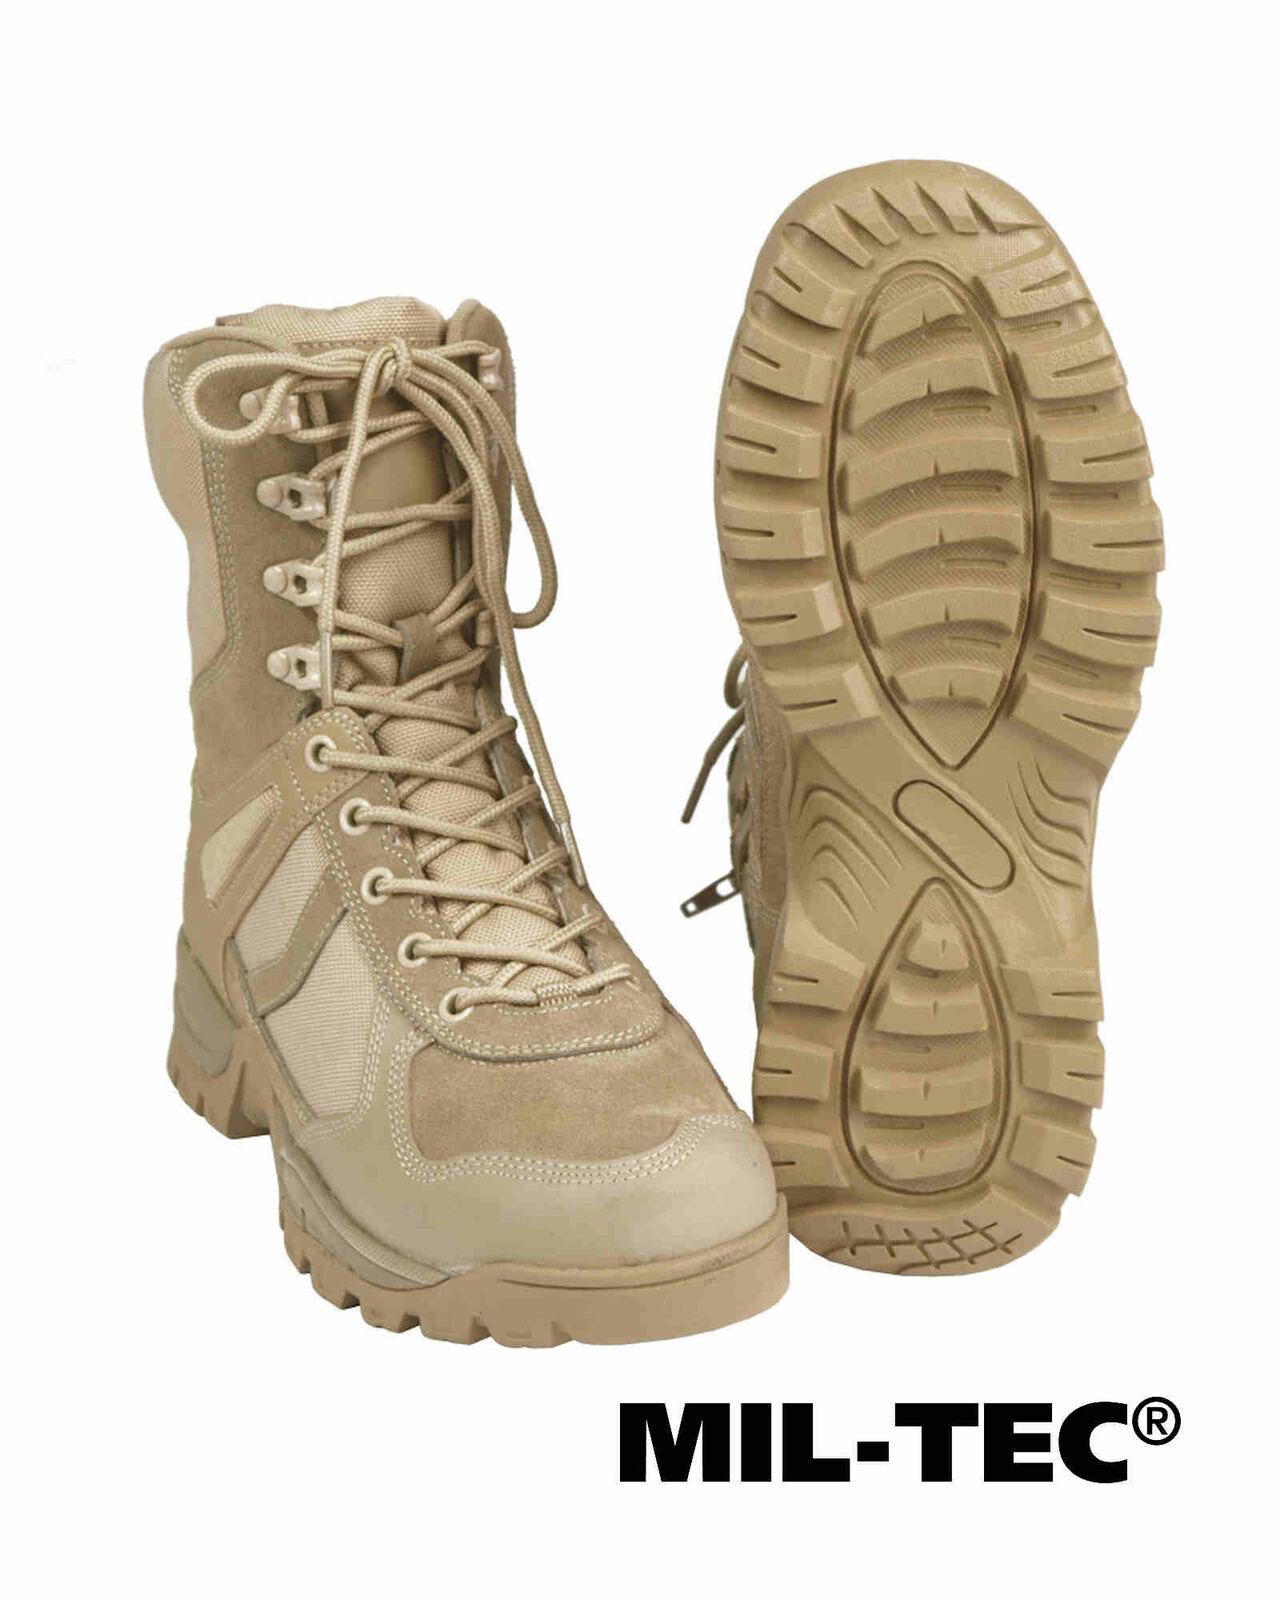 Mil-Tec Stiefel Schuhe PATROL ONE-ZIP COYOTE Stiefel Schuhe